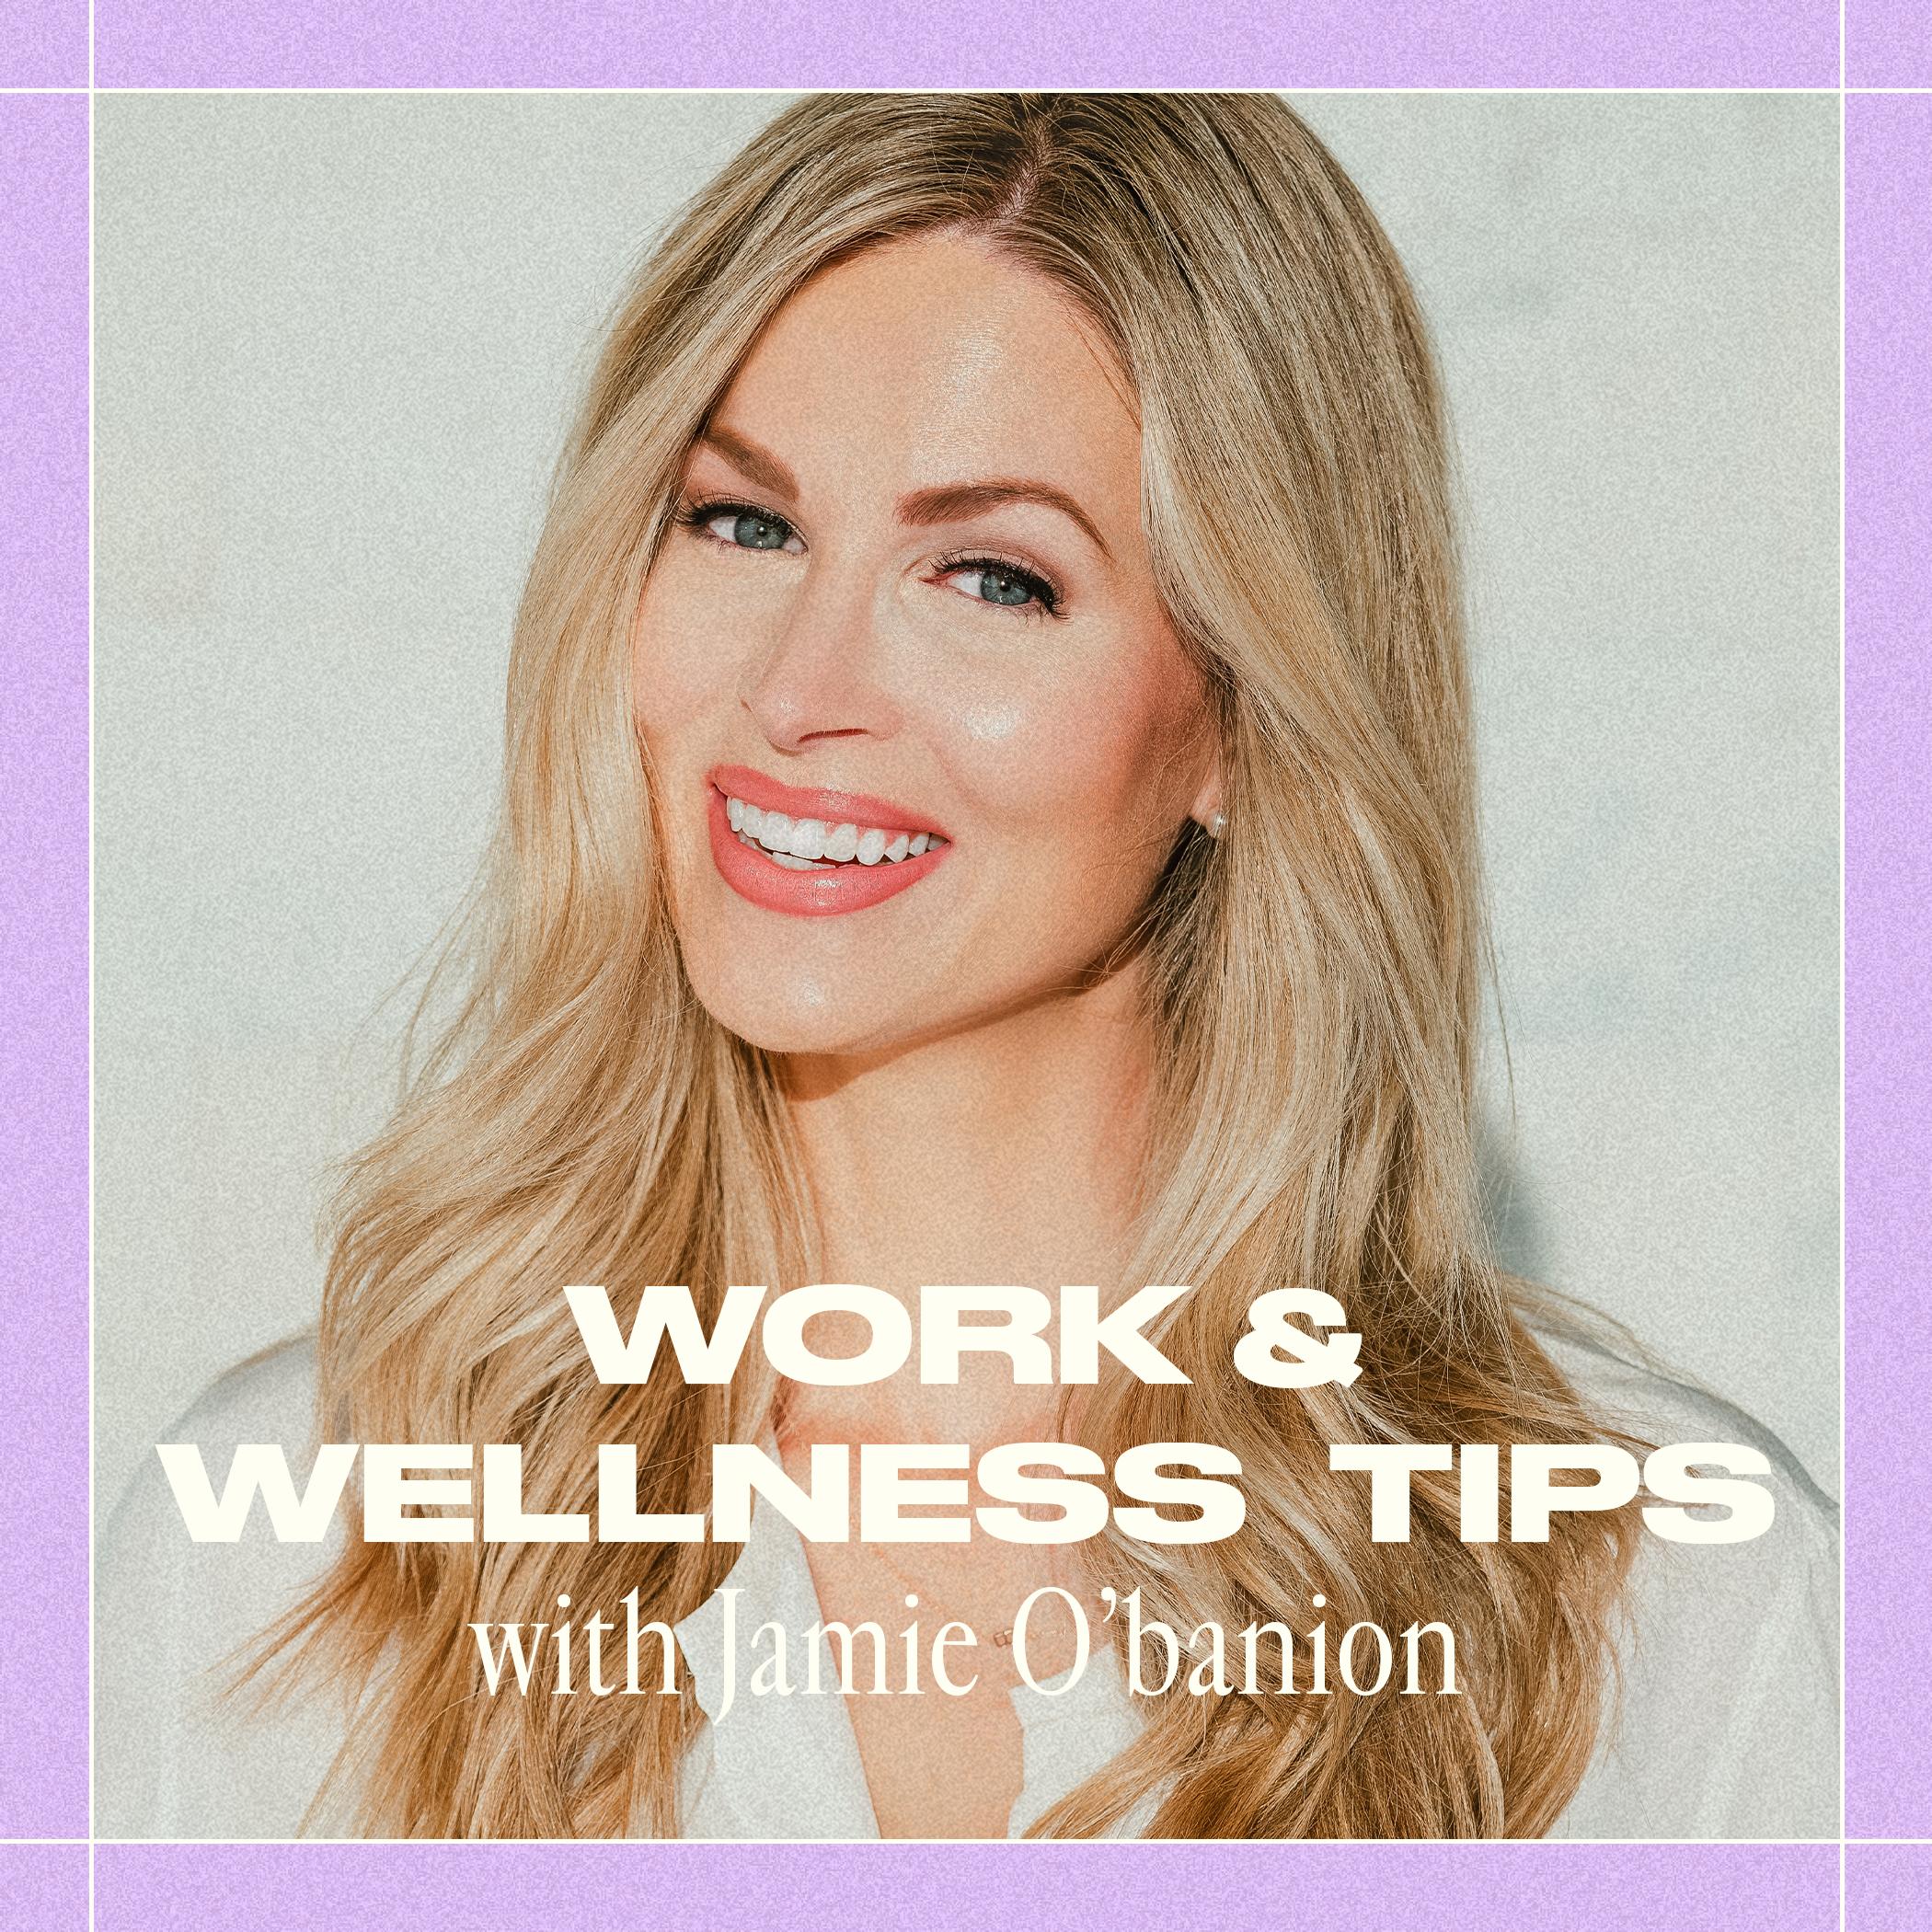 Work & Wellness Tips from Jamie O'Banion